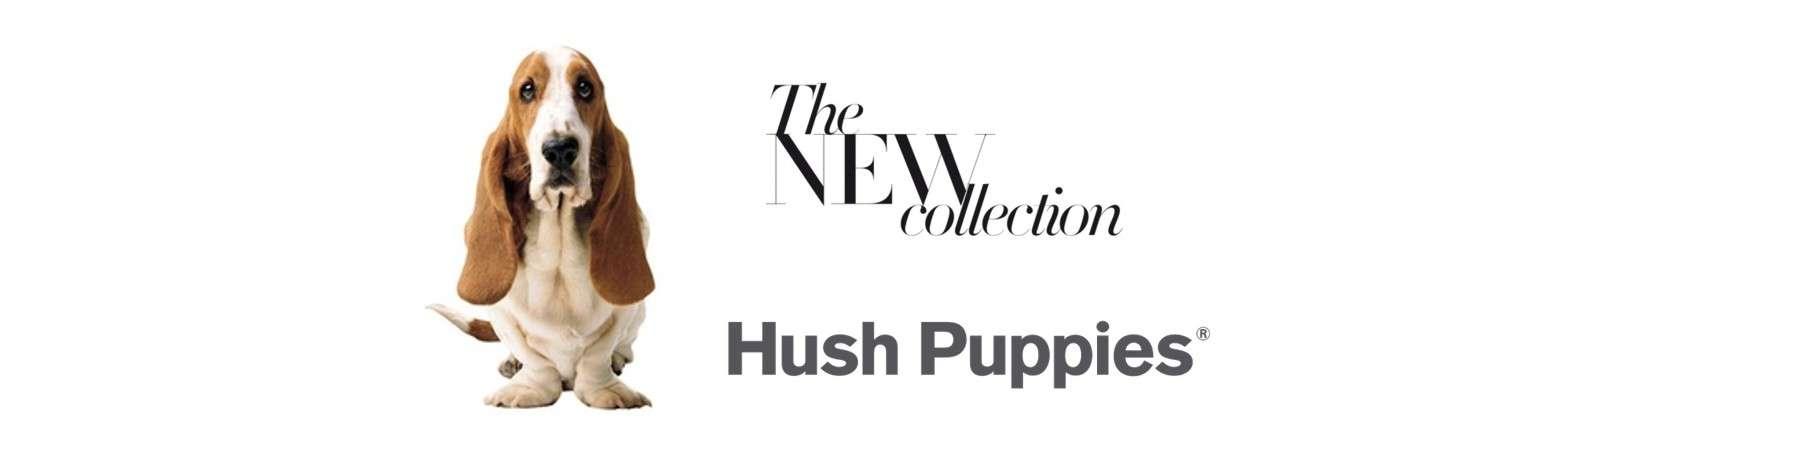 Hush_Puppies